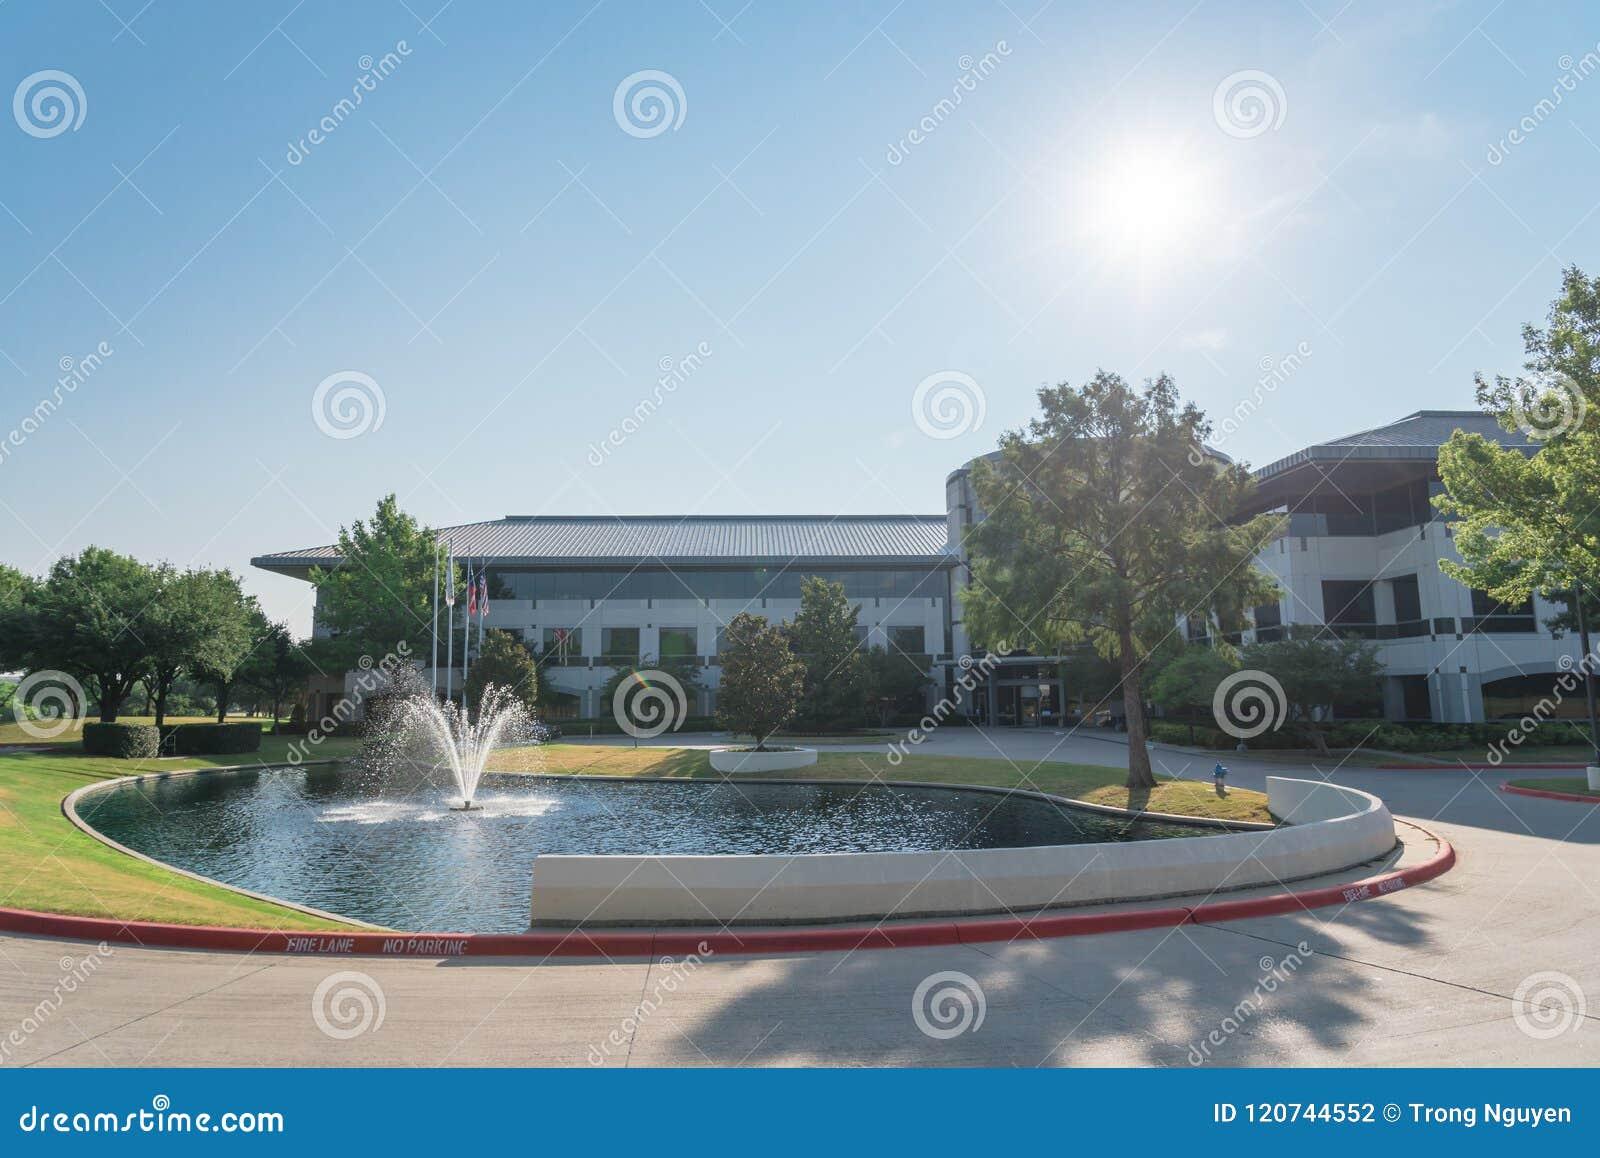 Keurig Pepper博士公司总部校园在普莱诺,德萨岛